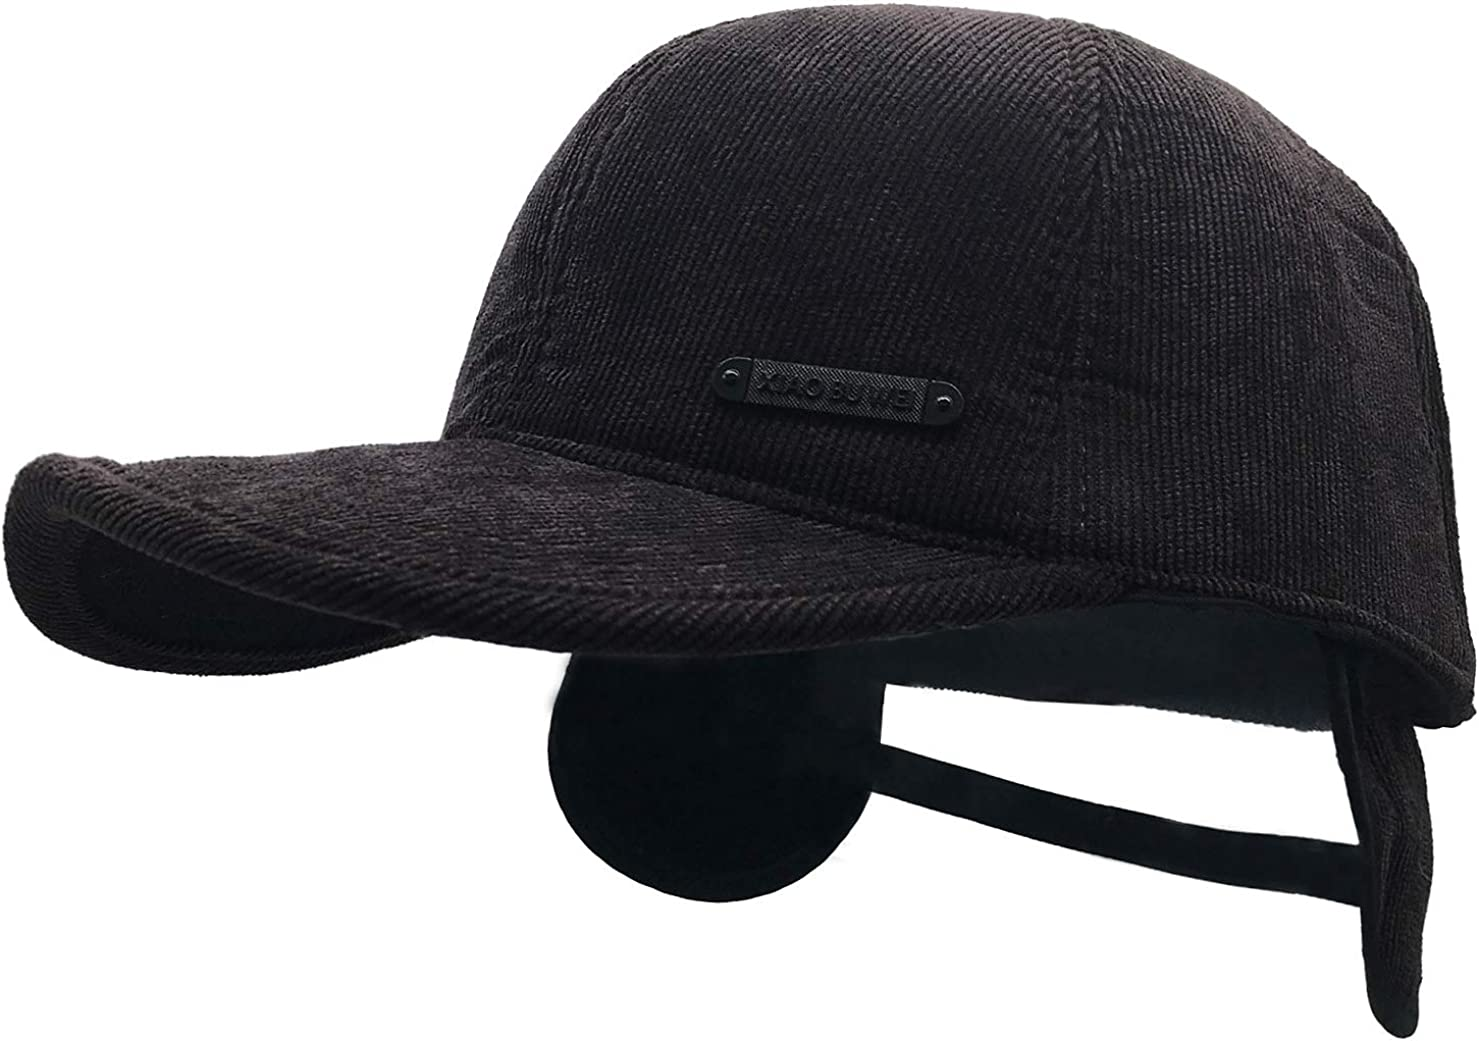 Pyrafox Adjustable Winter Earflap Aviator Hats Fleece Lined Cold Weather Visor Baseball Cap